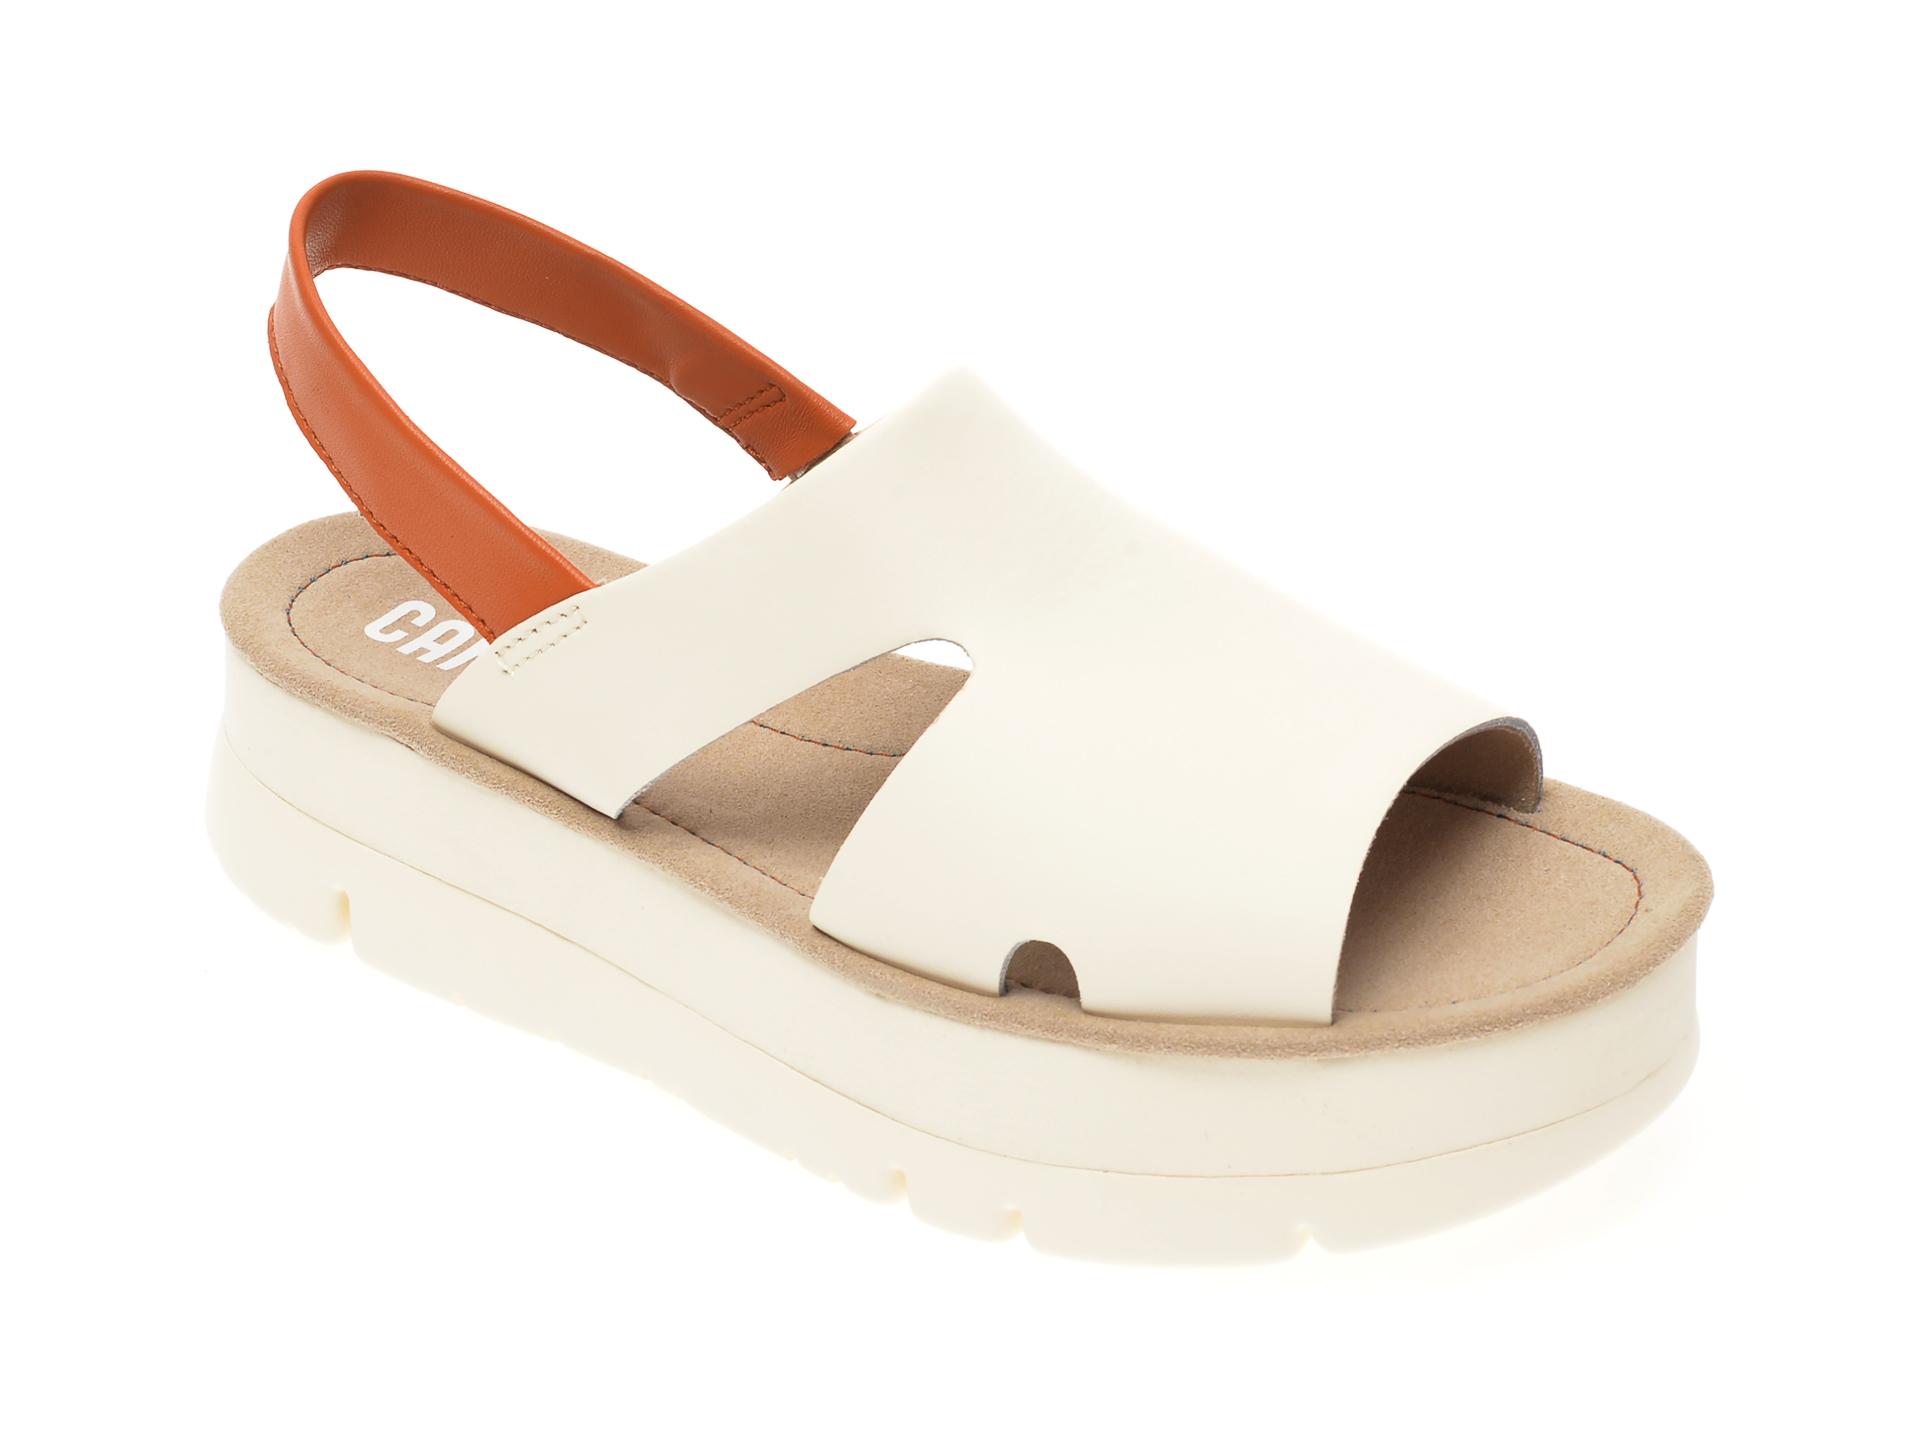 Sandale CAMPER albe, K200848, din piele naturala